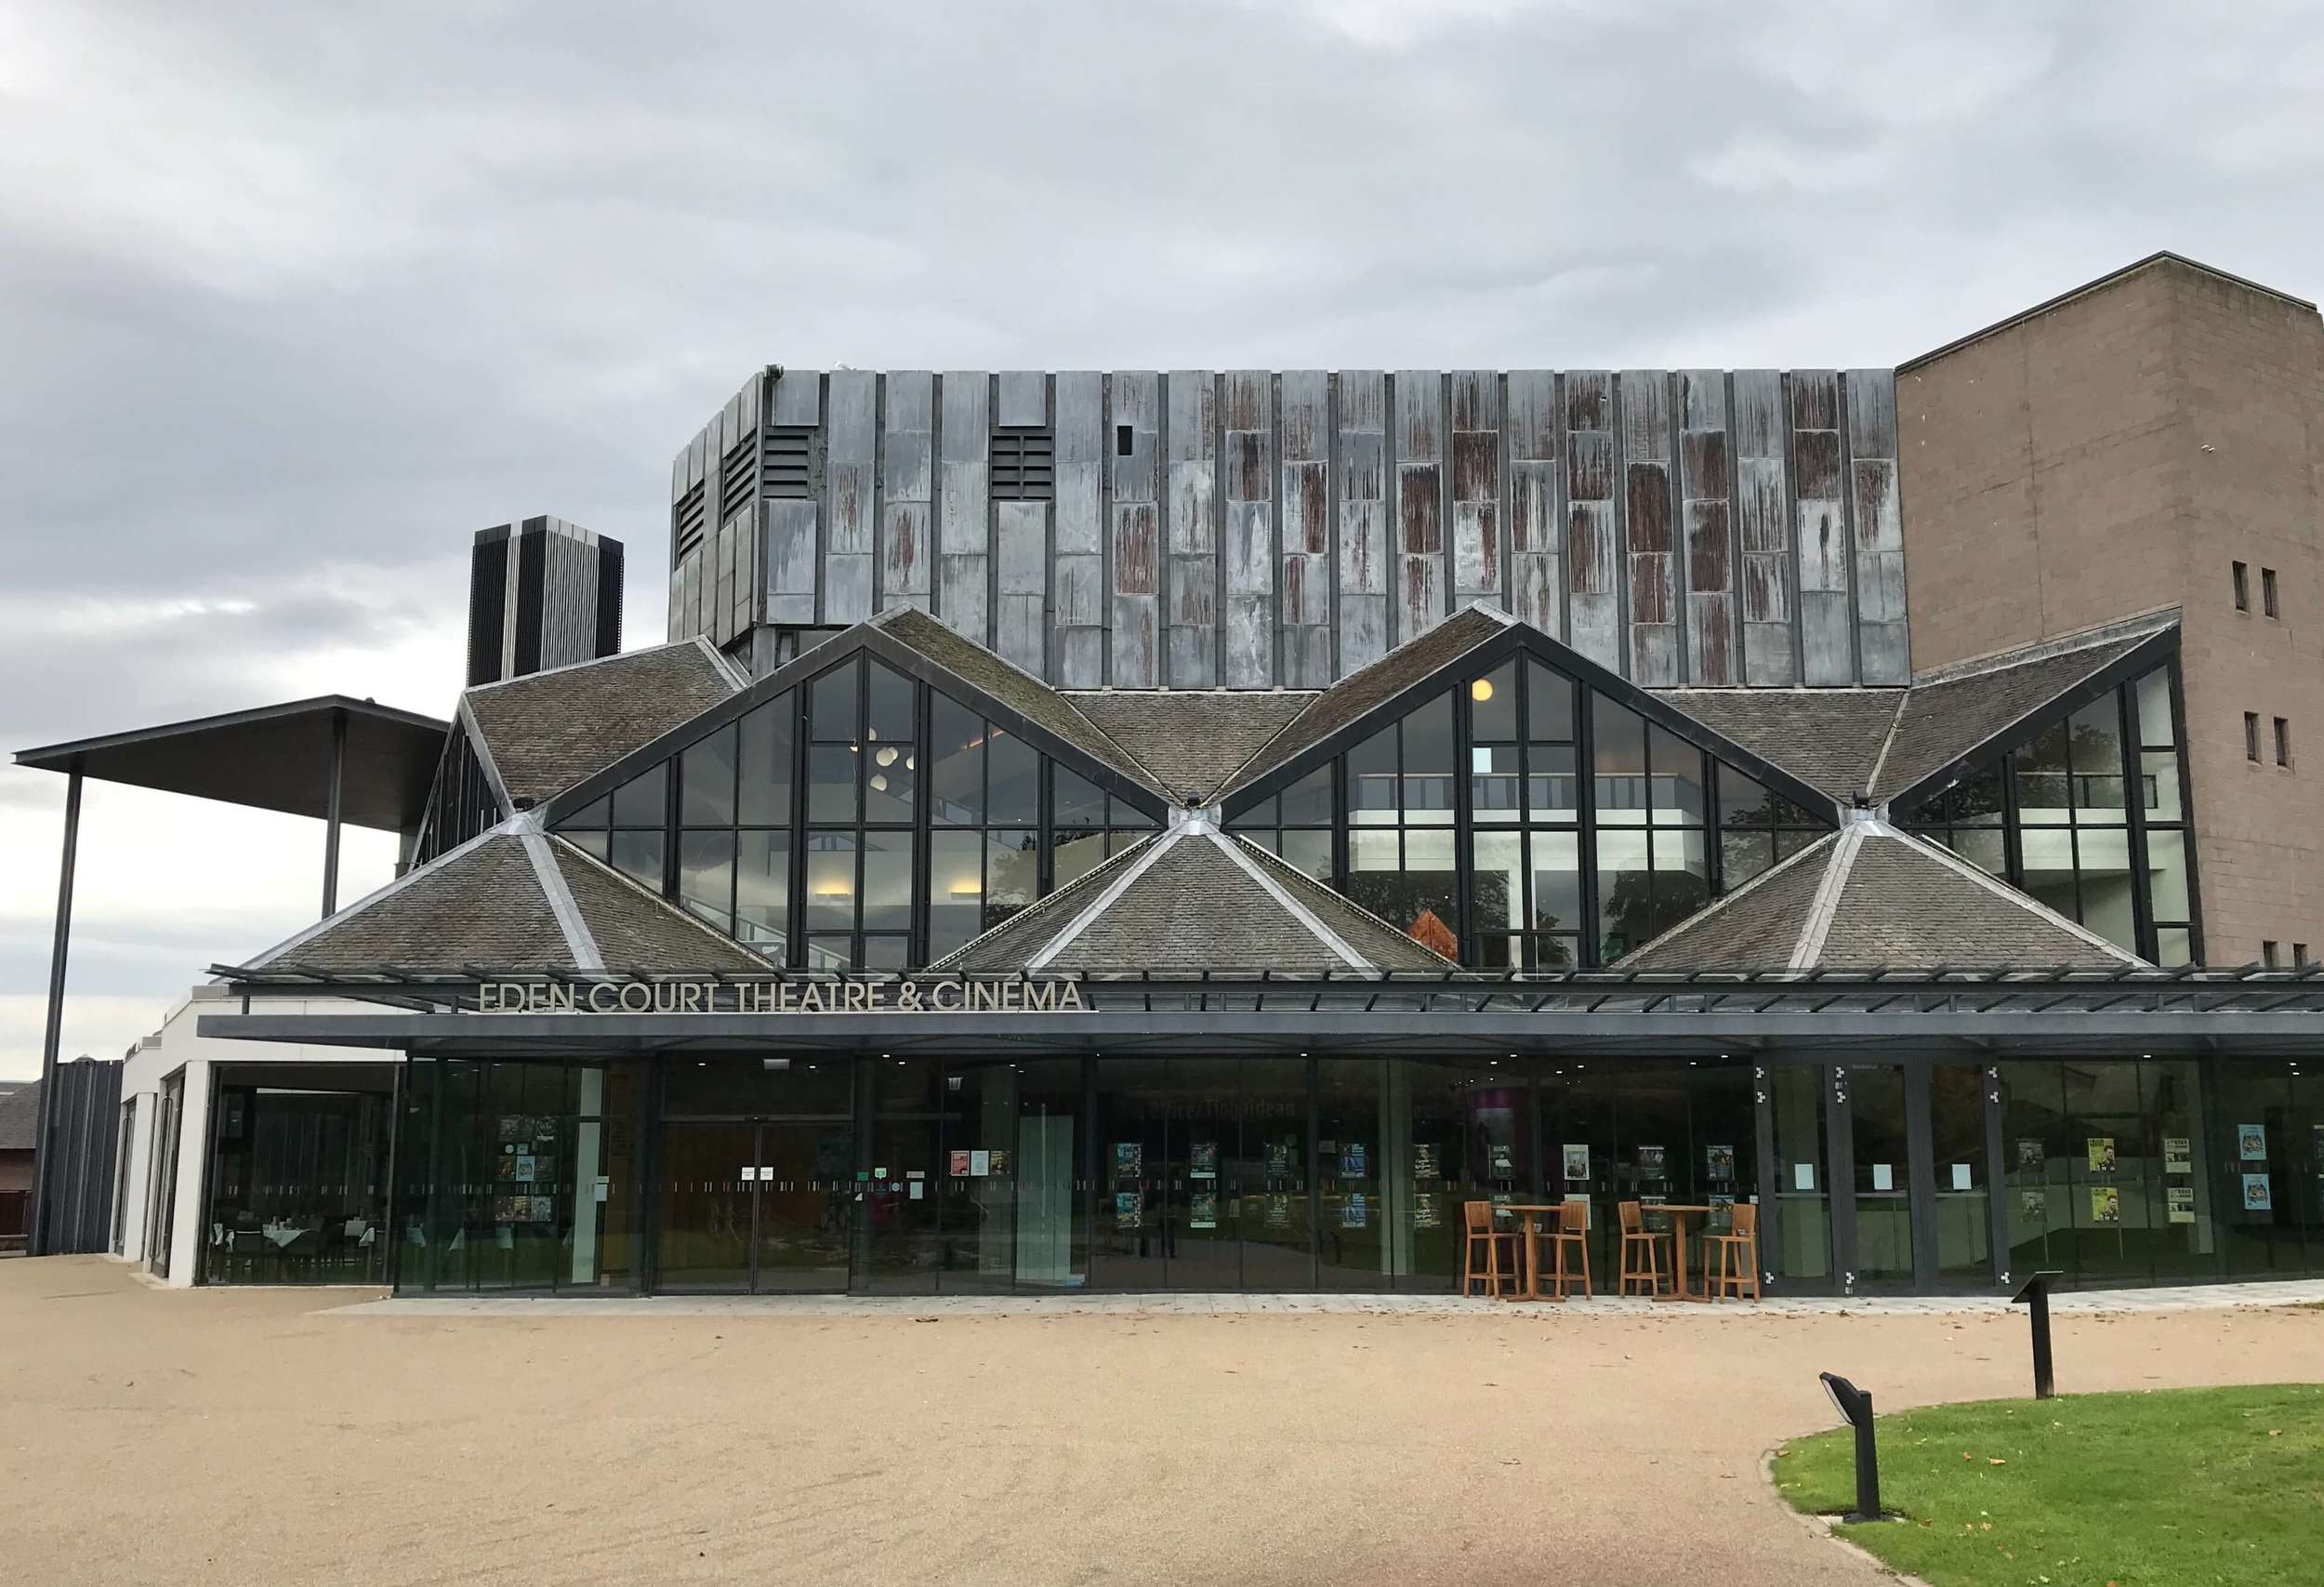 Eden Court Theatre in Inverness